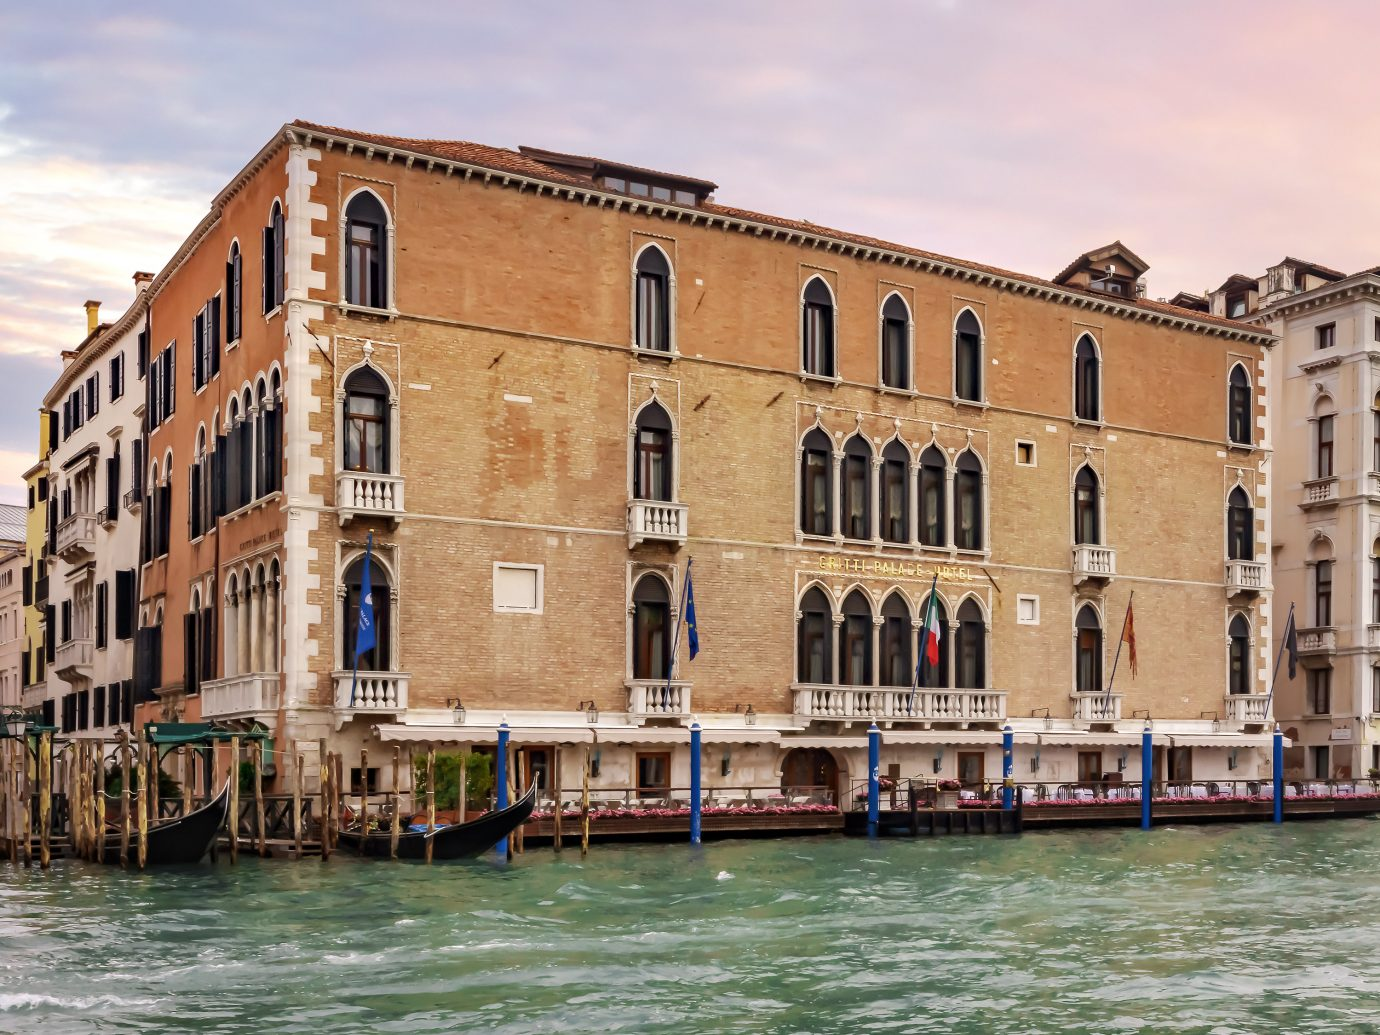 Exterior of Gritti Palace, Venice